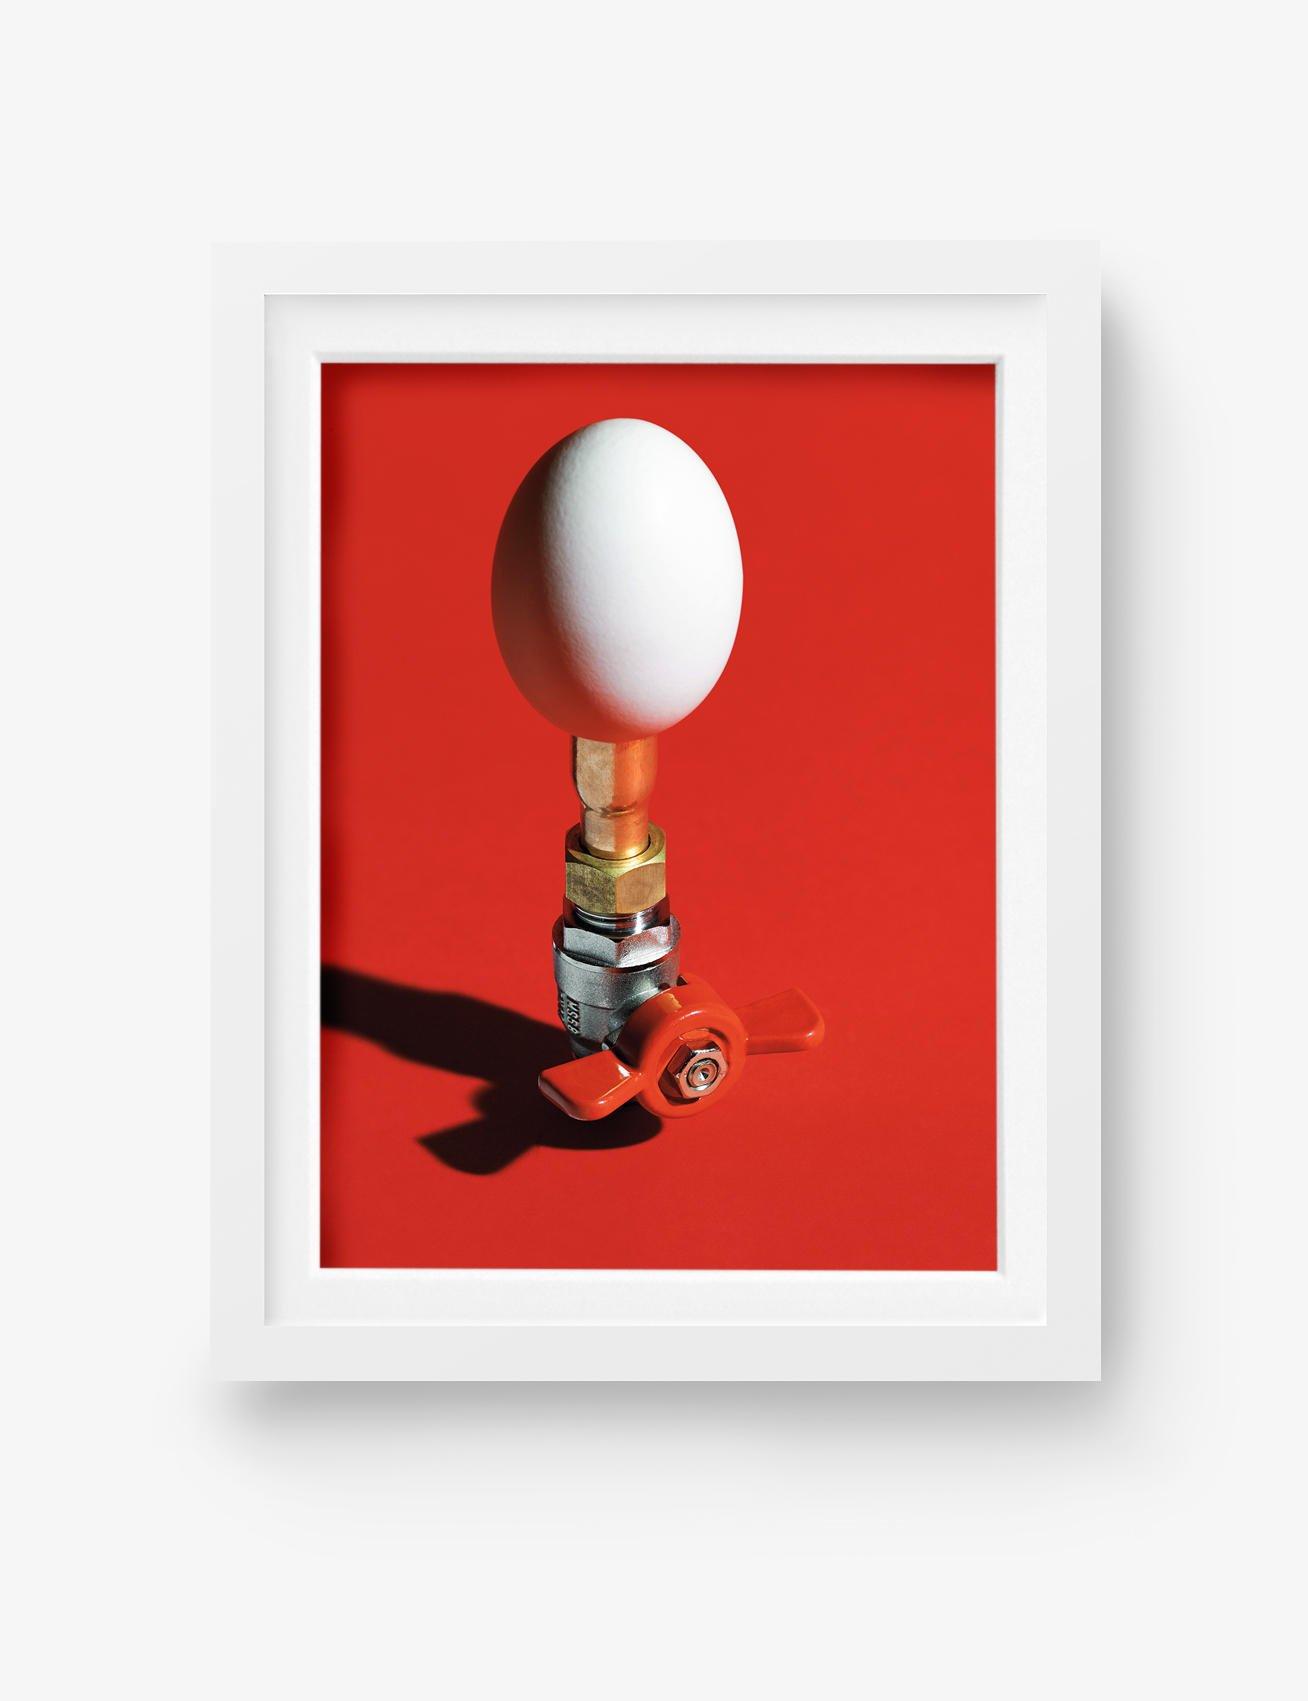 Tirage_Louise_Lsaviero_4_Egg